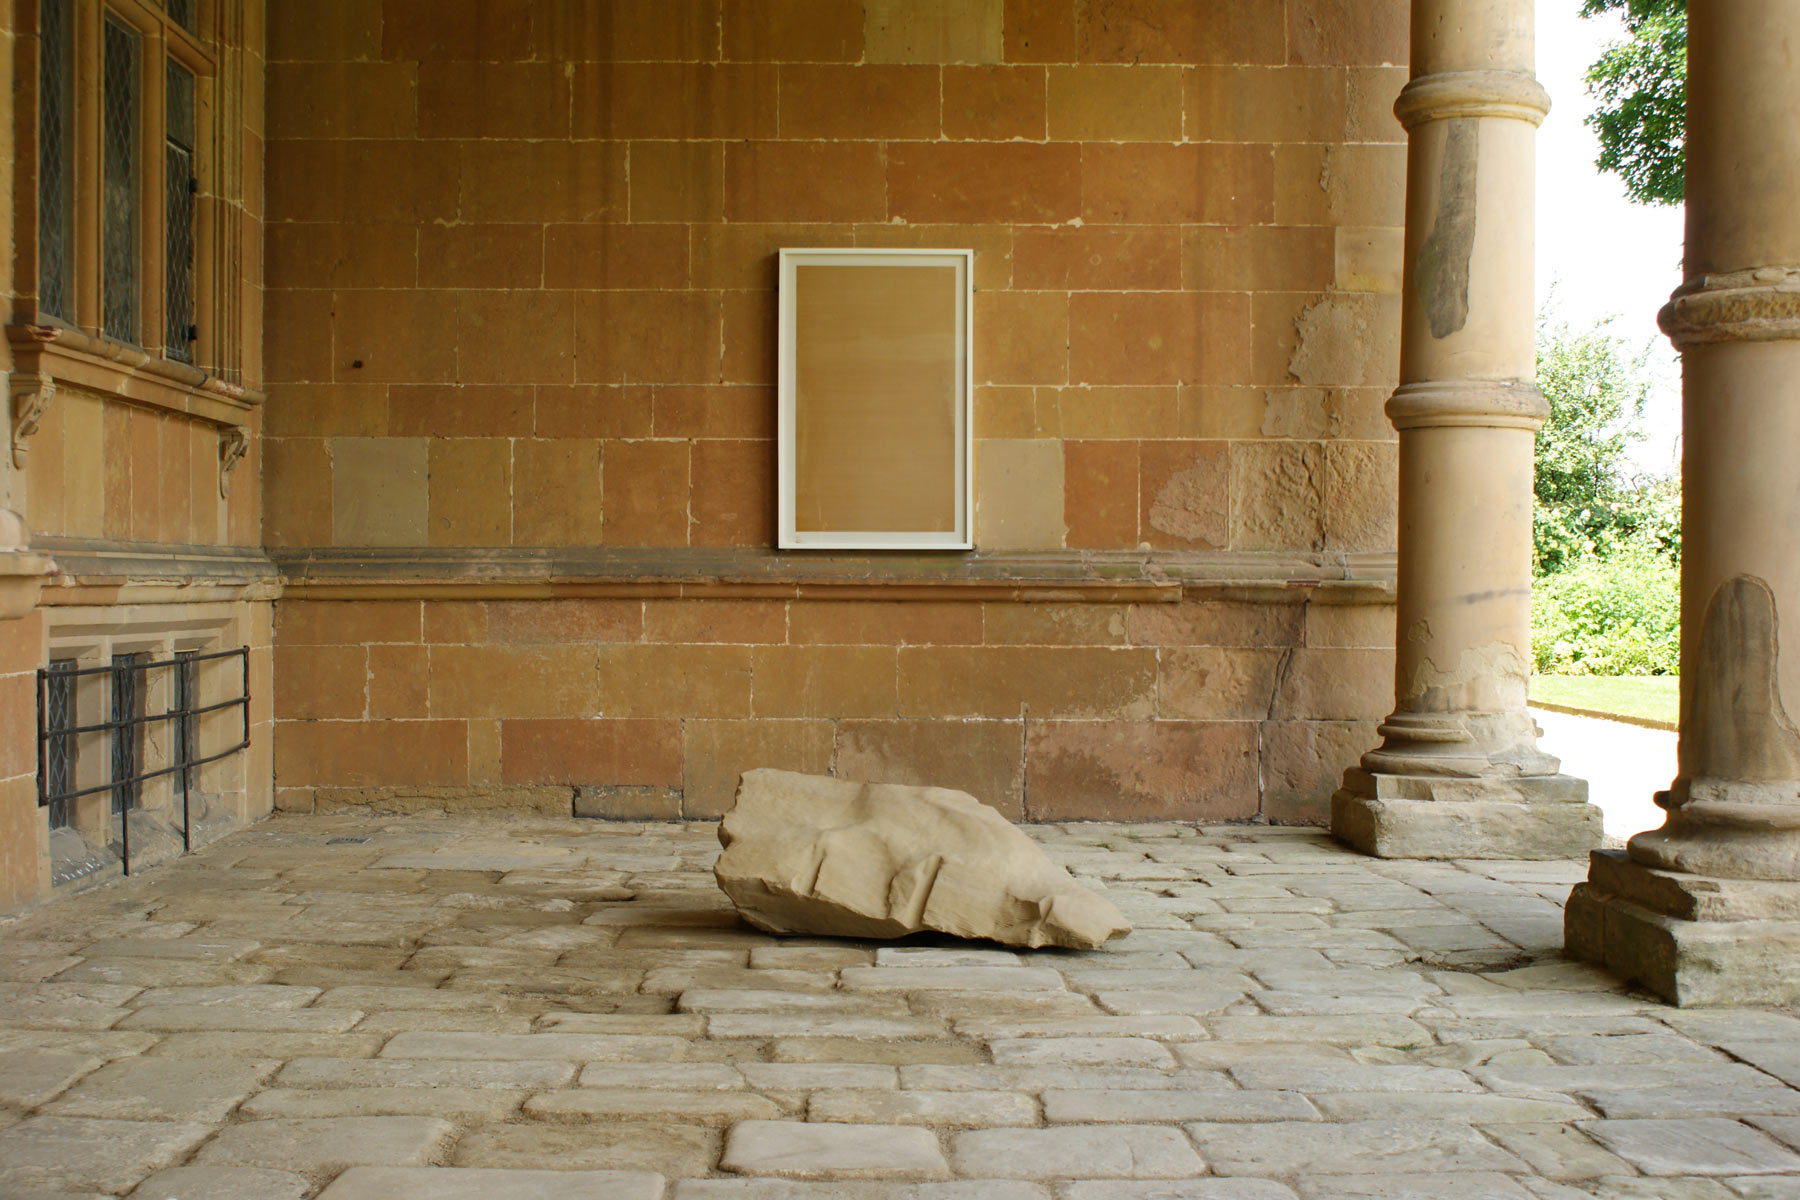 Alastair Mackie|Epitaph|2014|Meadow Arts|National Trust|Hardwick Hall|sculpture|installation